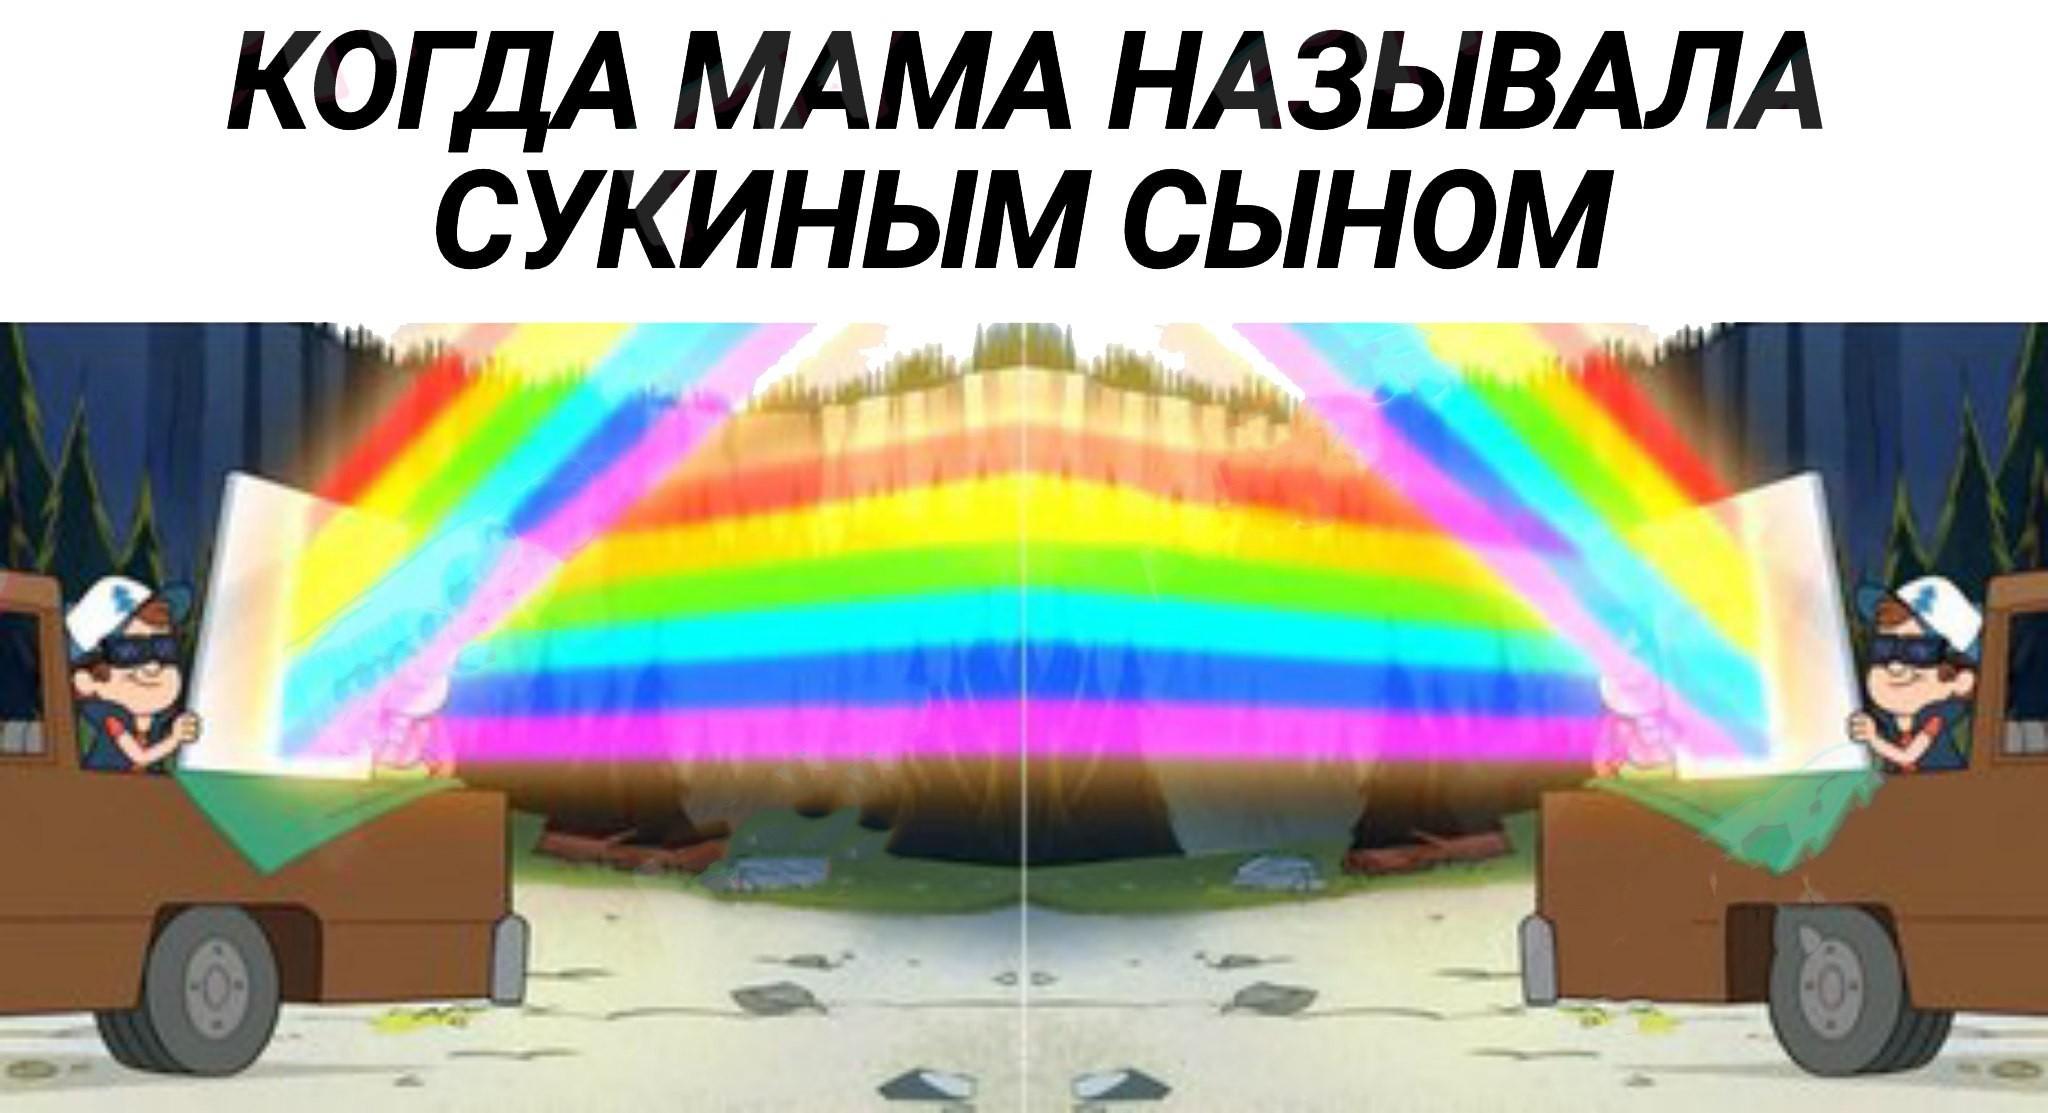 Tak vot - meme